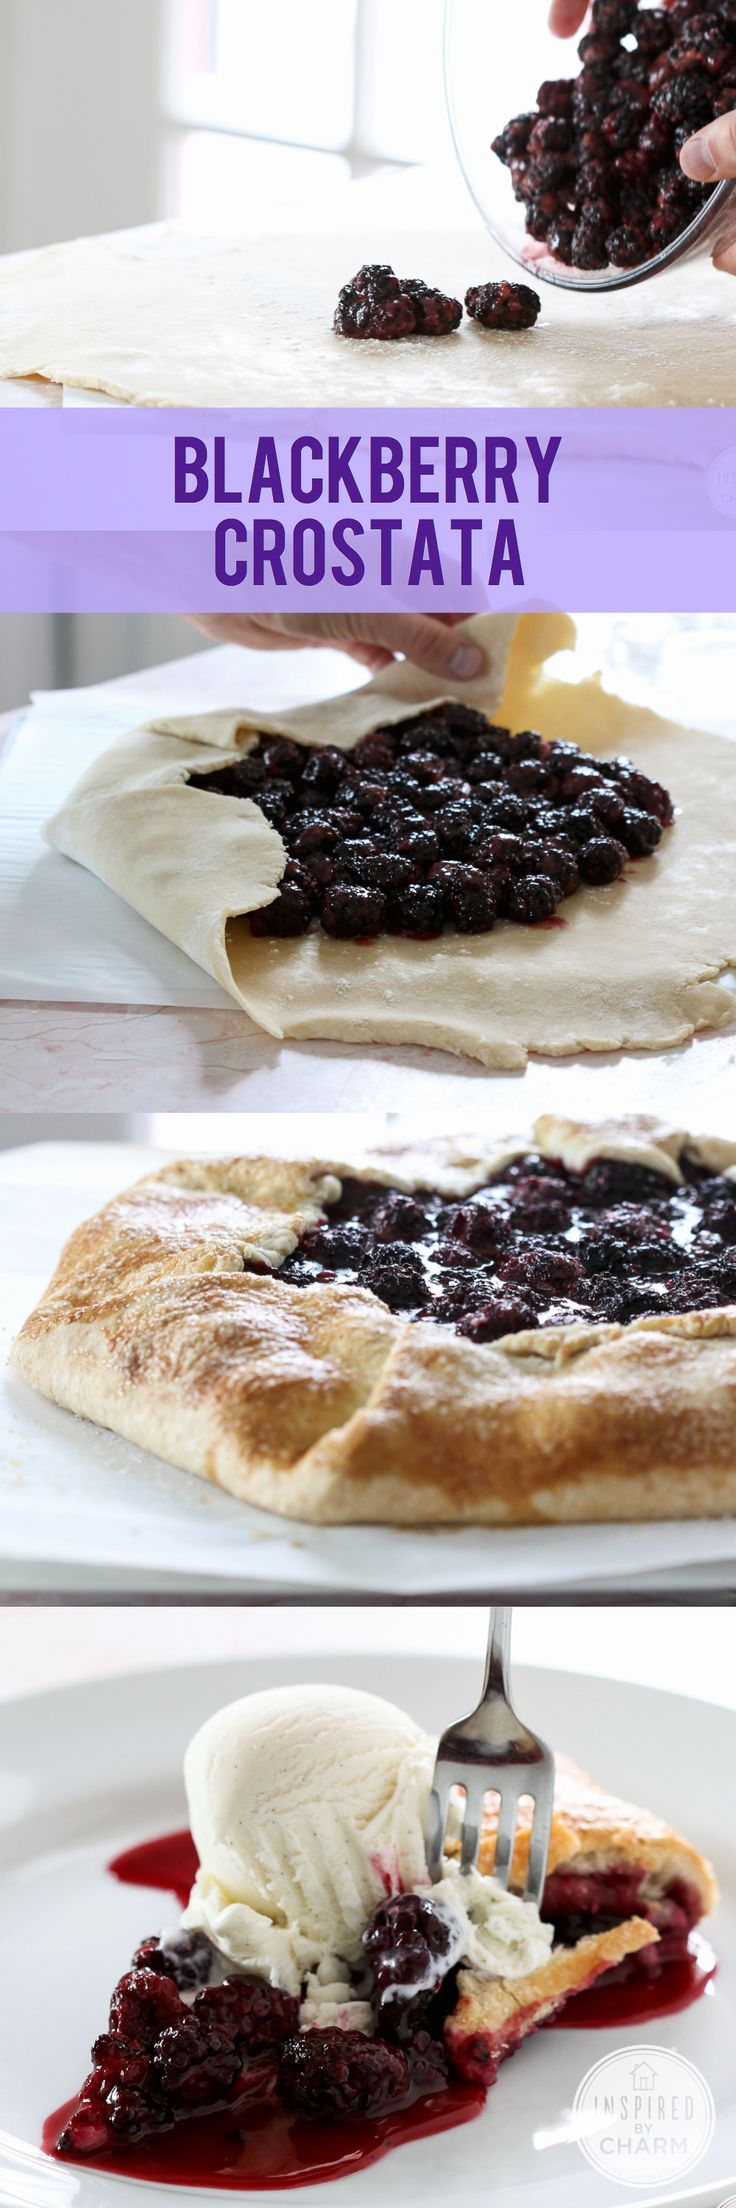 Blackberry Crostata